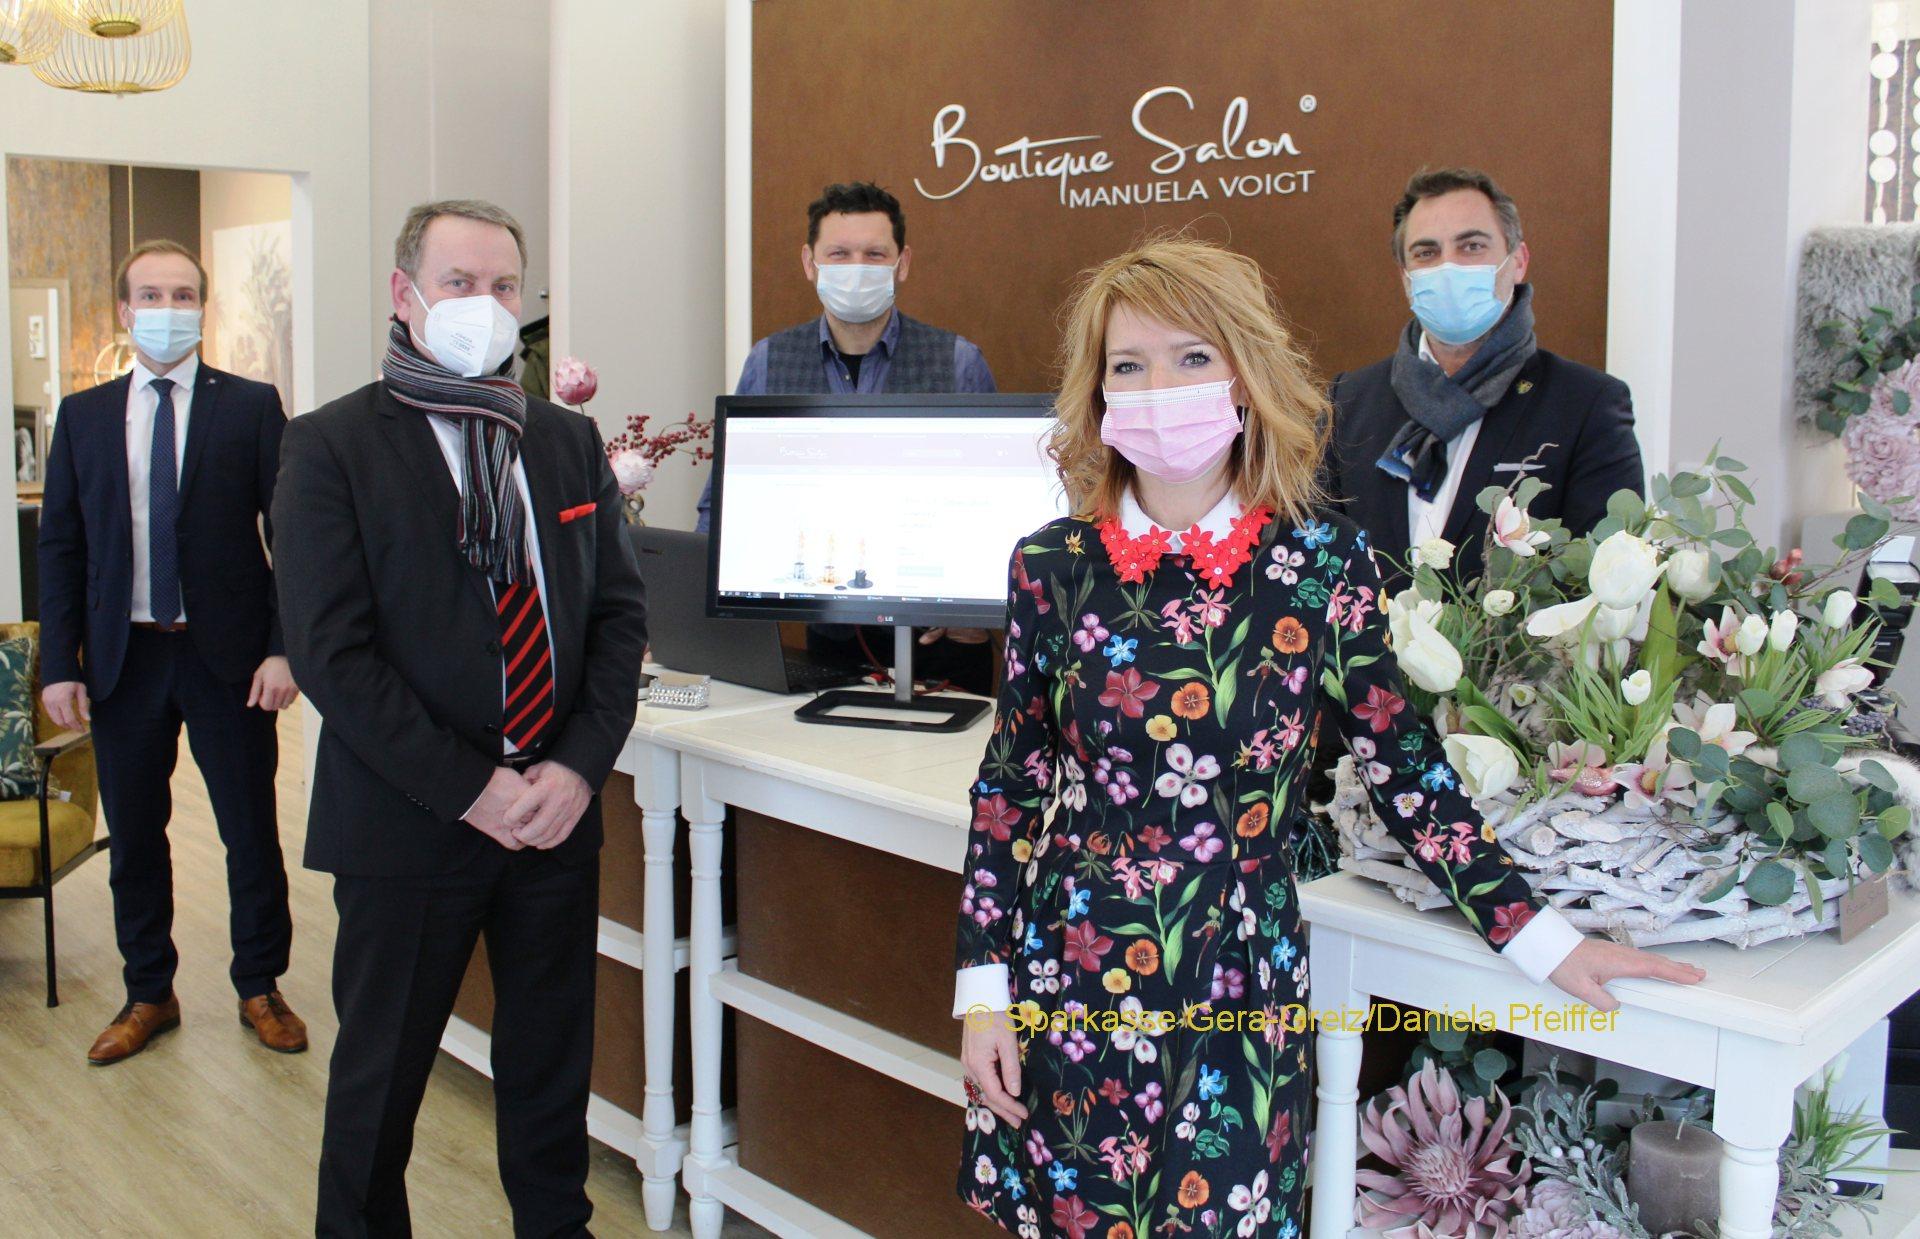 Geraer Friseurmeisterin eröffnet Online-Shop